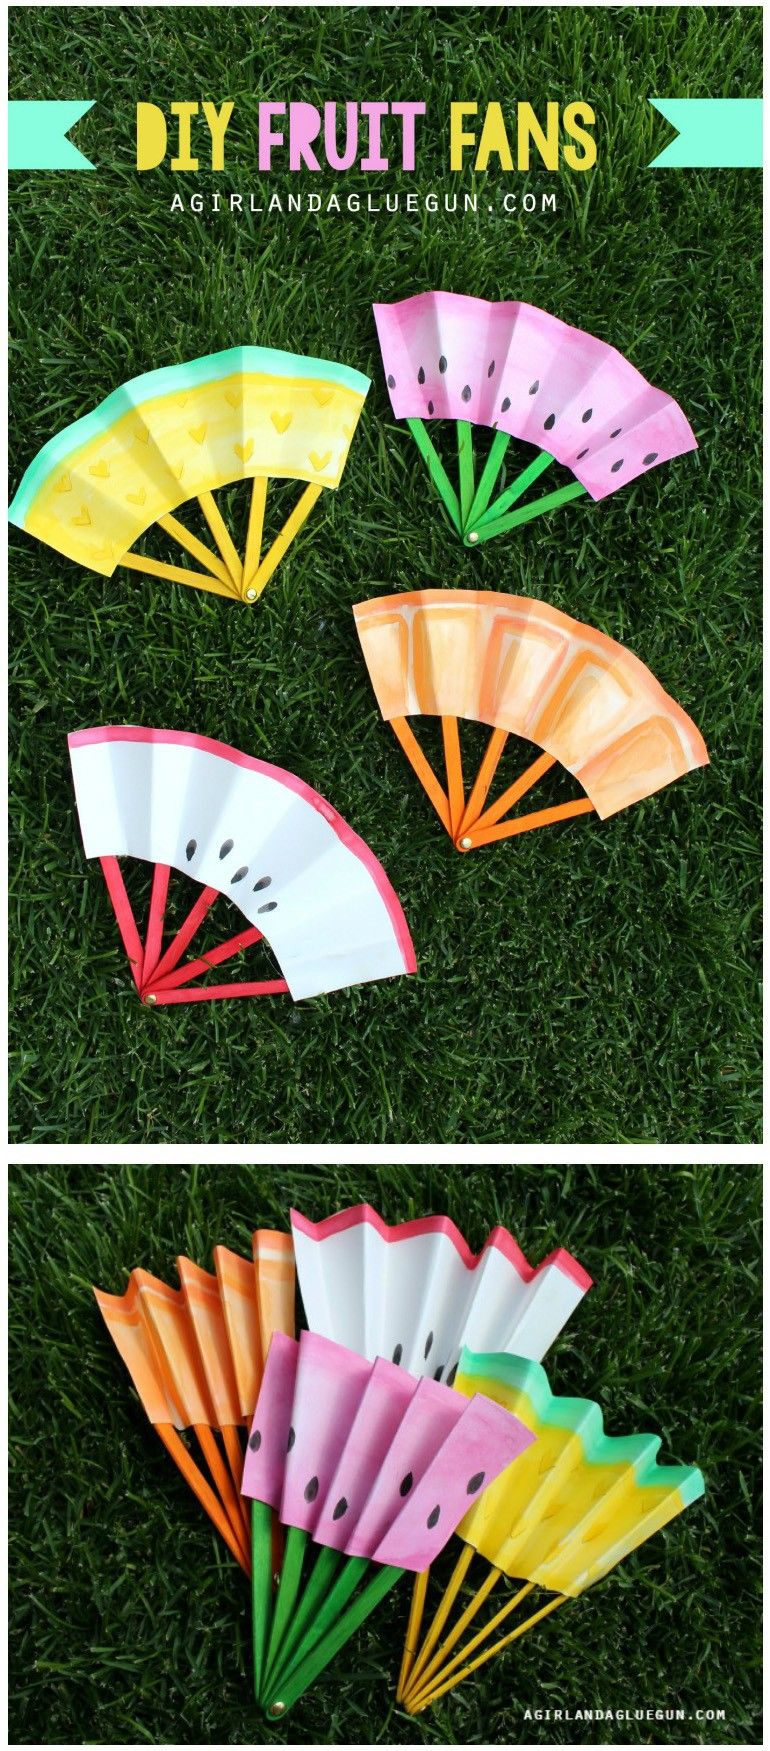 19 Easy To Make Summer Crafts For Kids Popsicle Stick Crafts